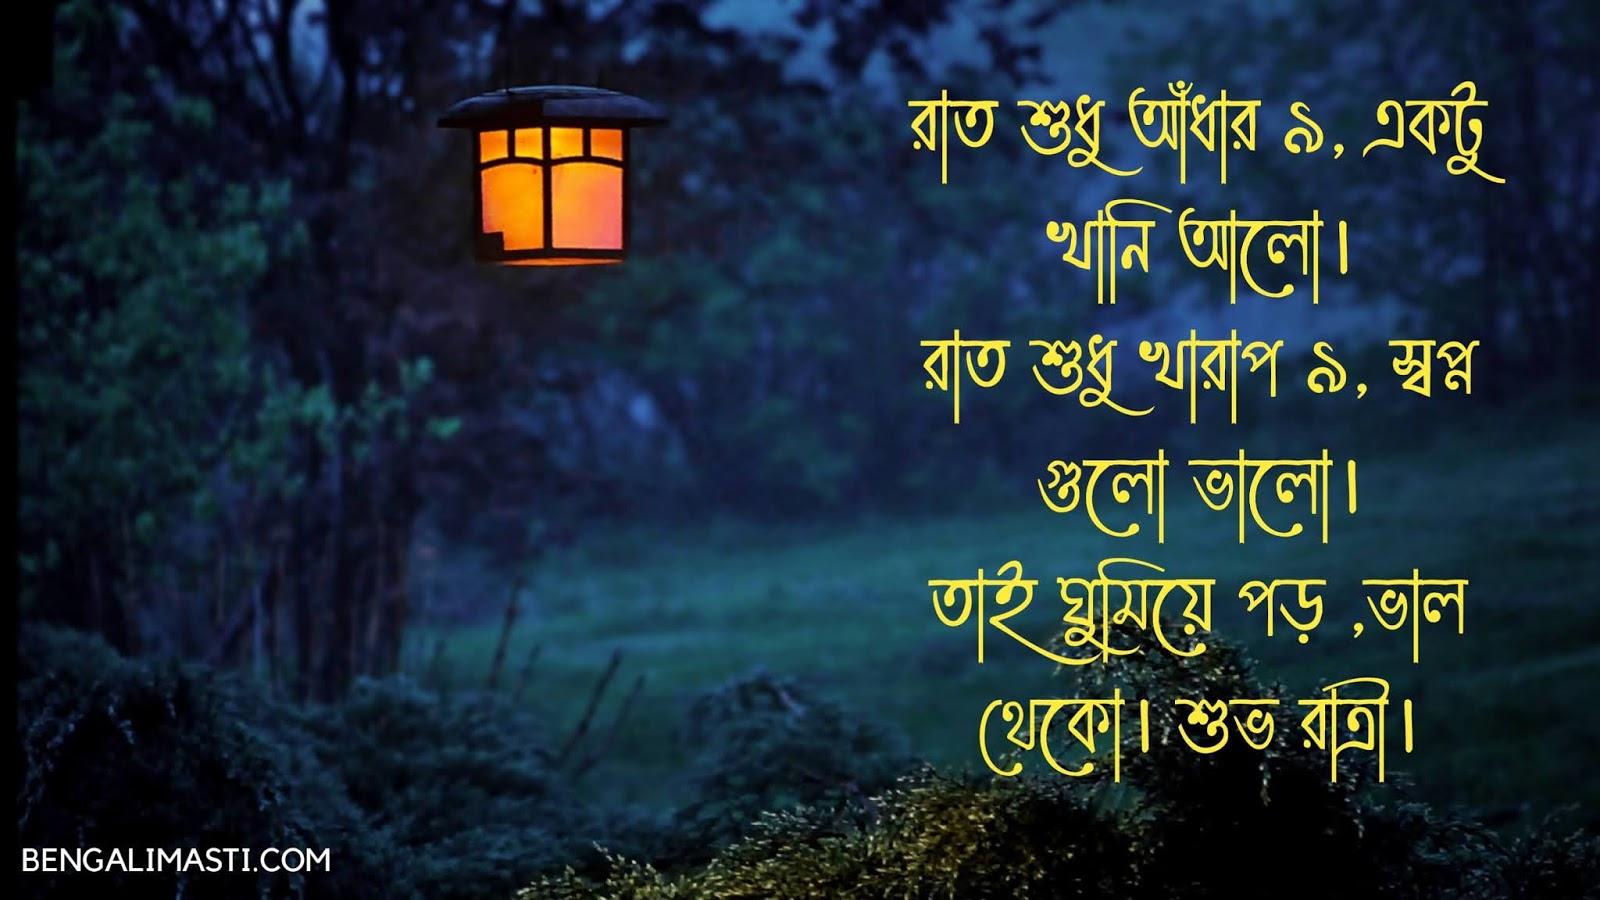 Bangla good night status